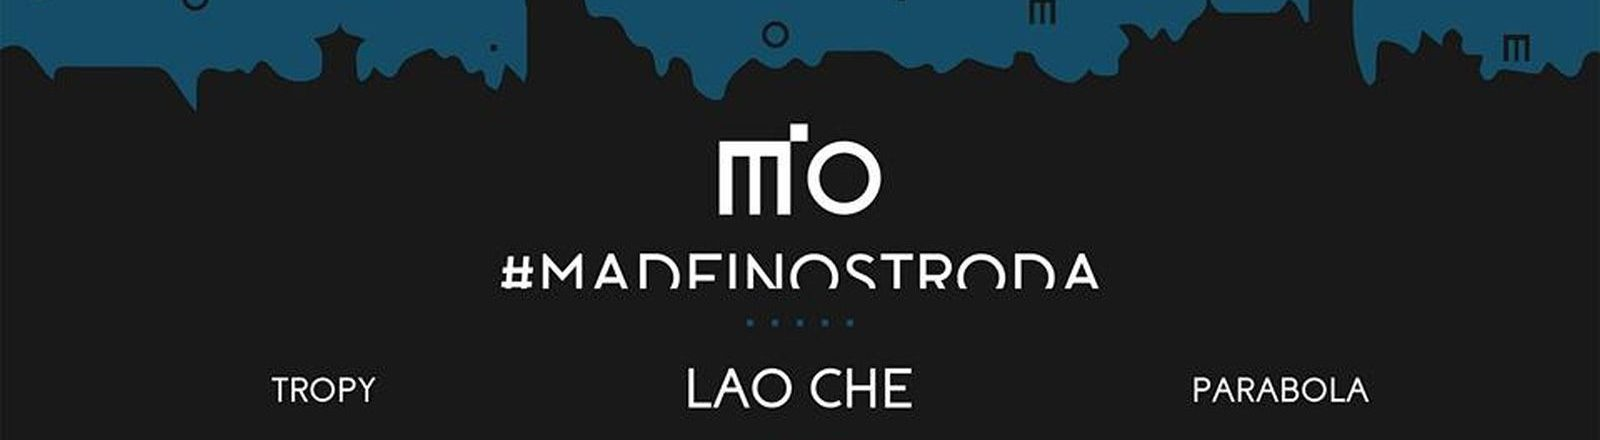 LAO CHE , TROPY , PARABOLA | #madeinostroda